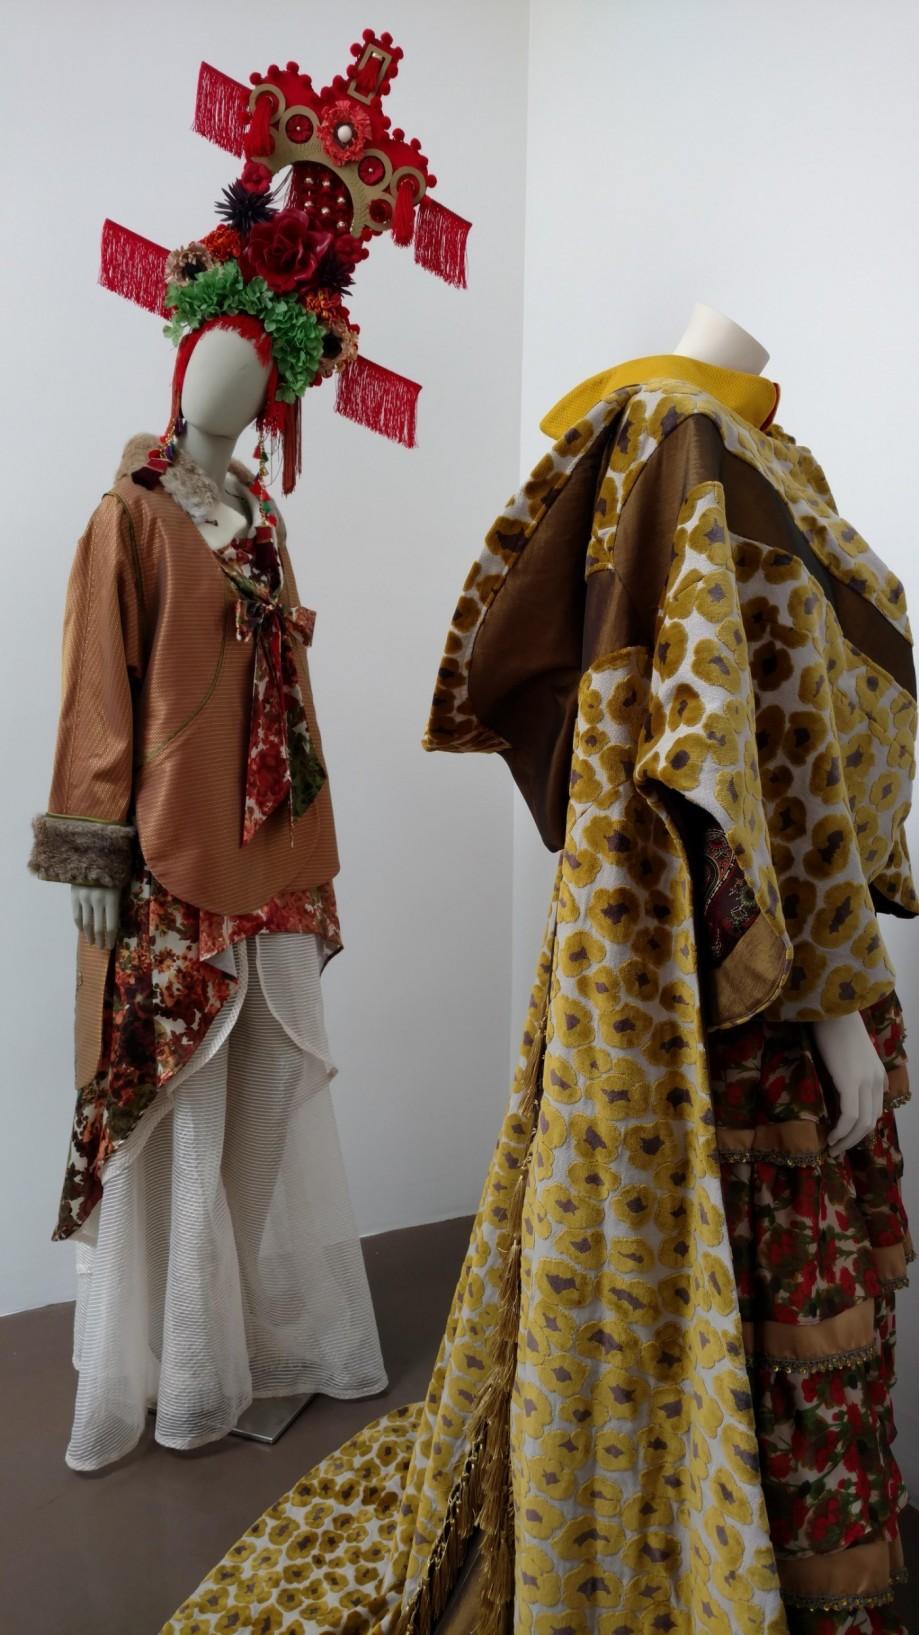 curated by Rhonda P. Hill, Blurred Boundaries Fashion as an Art exhibit, Alena Kalana, designer, GraySpace Gallery, Santa Barbara, ©EDGExpo.com